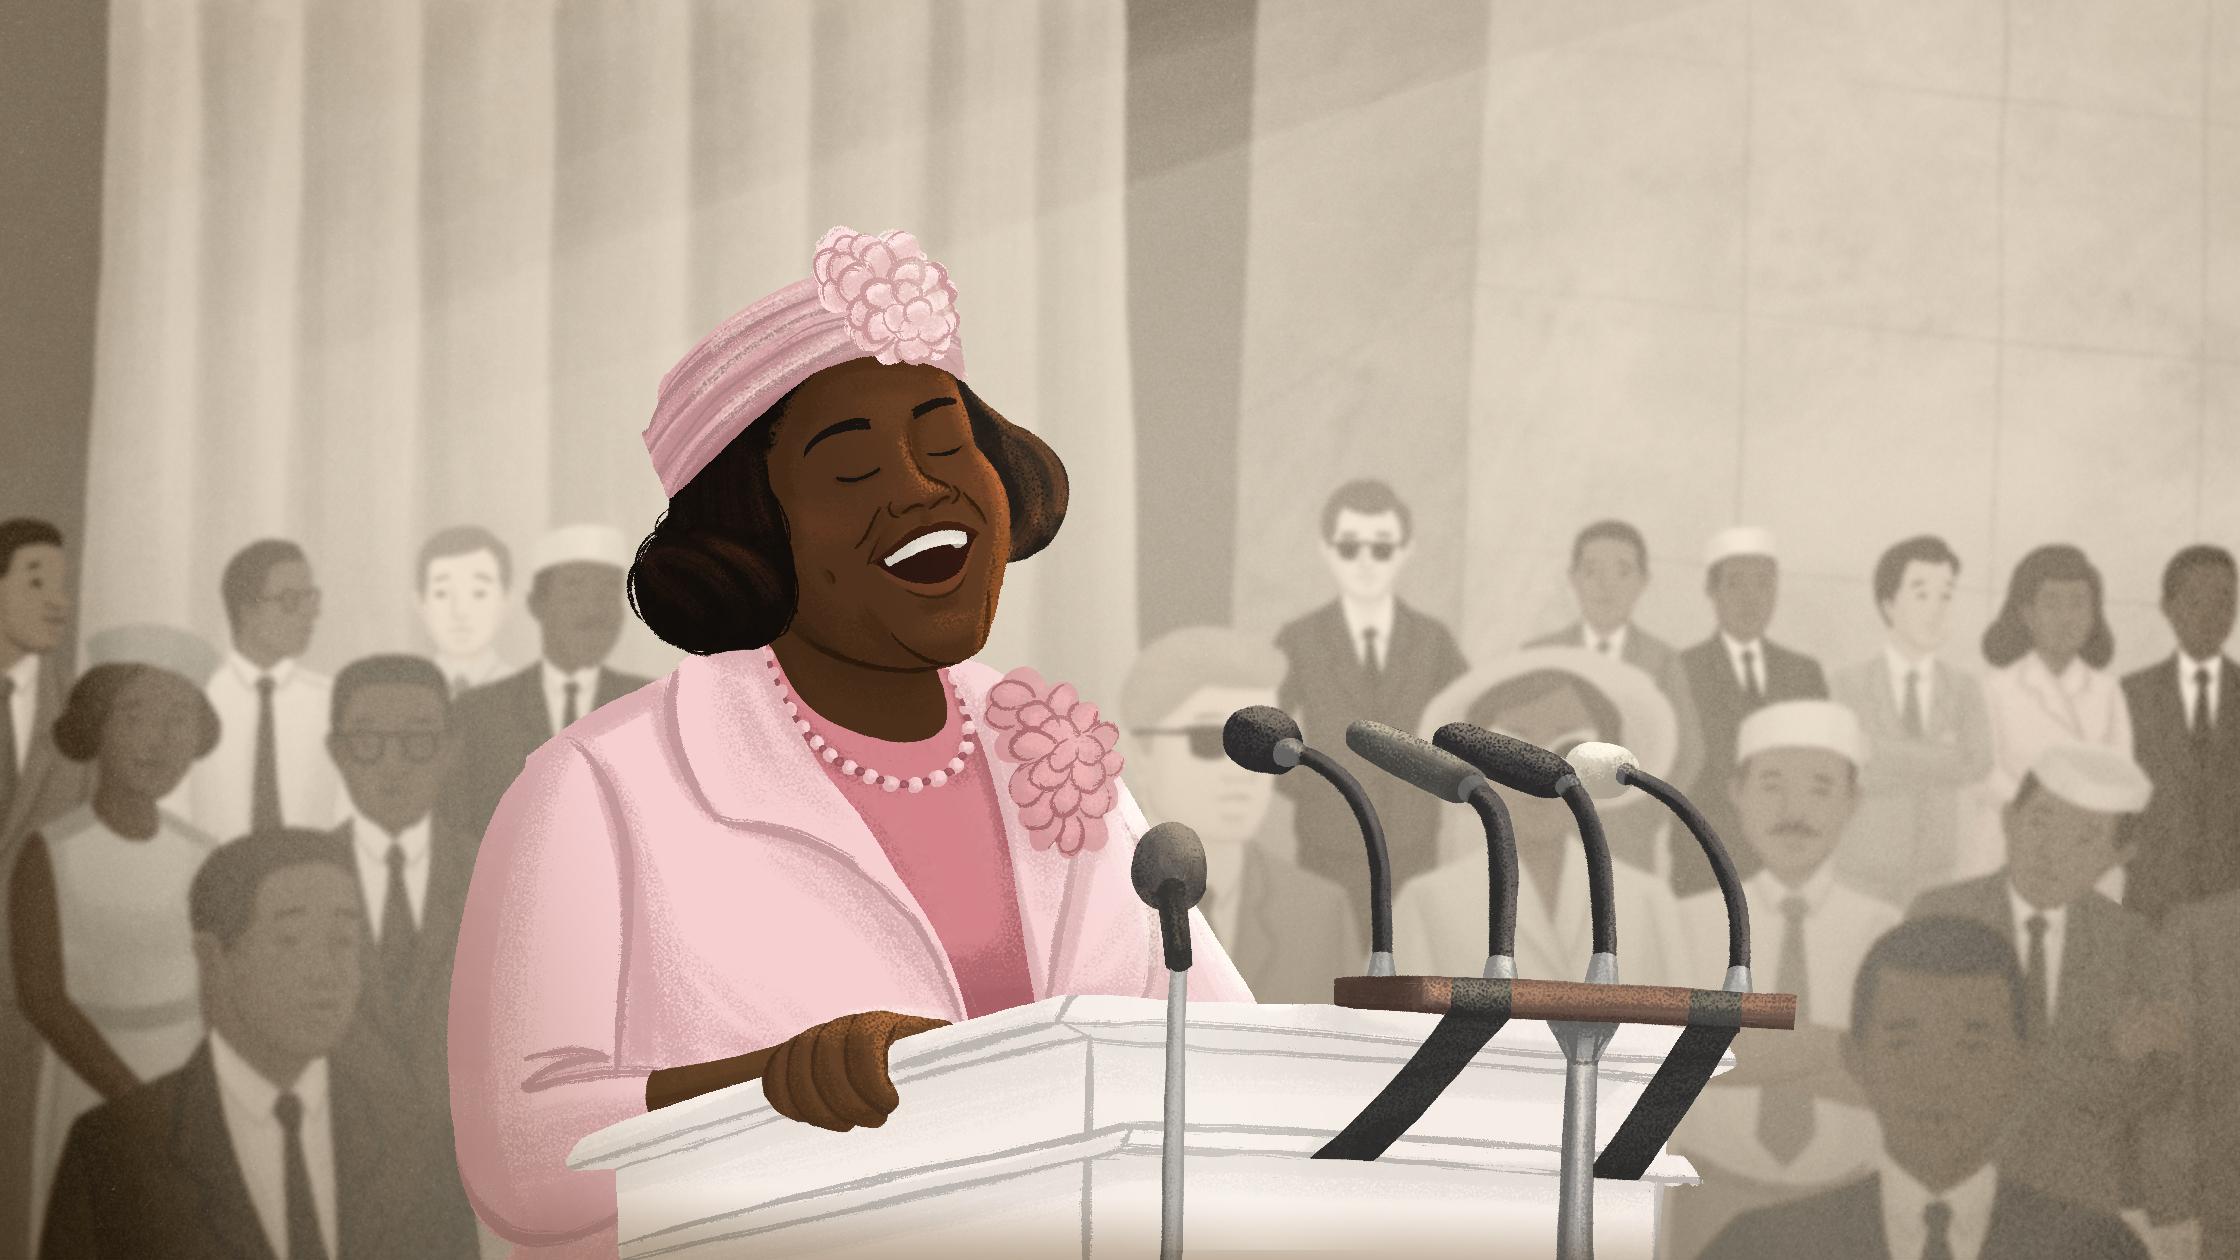 Black Woman At Podium Illustration